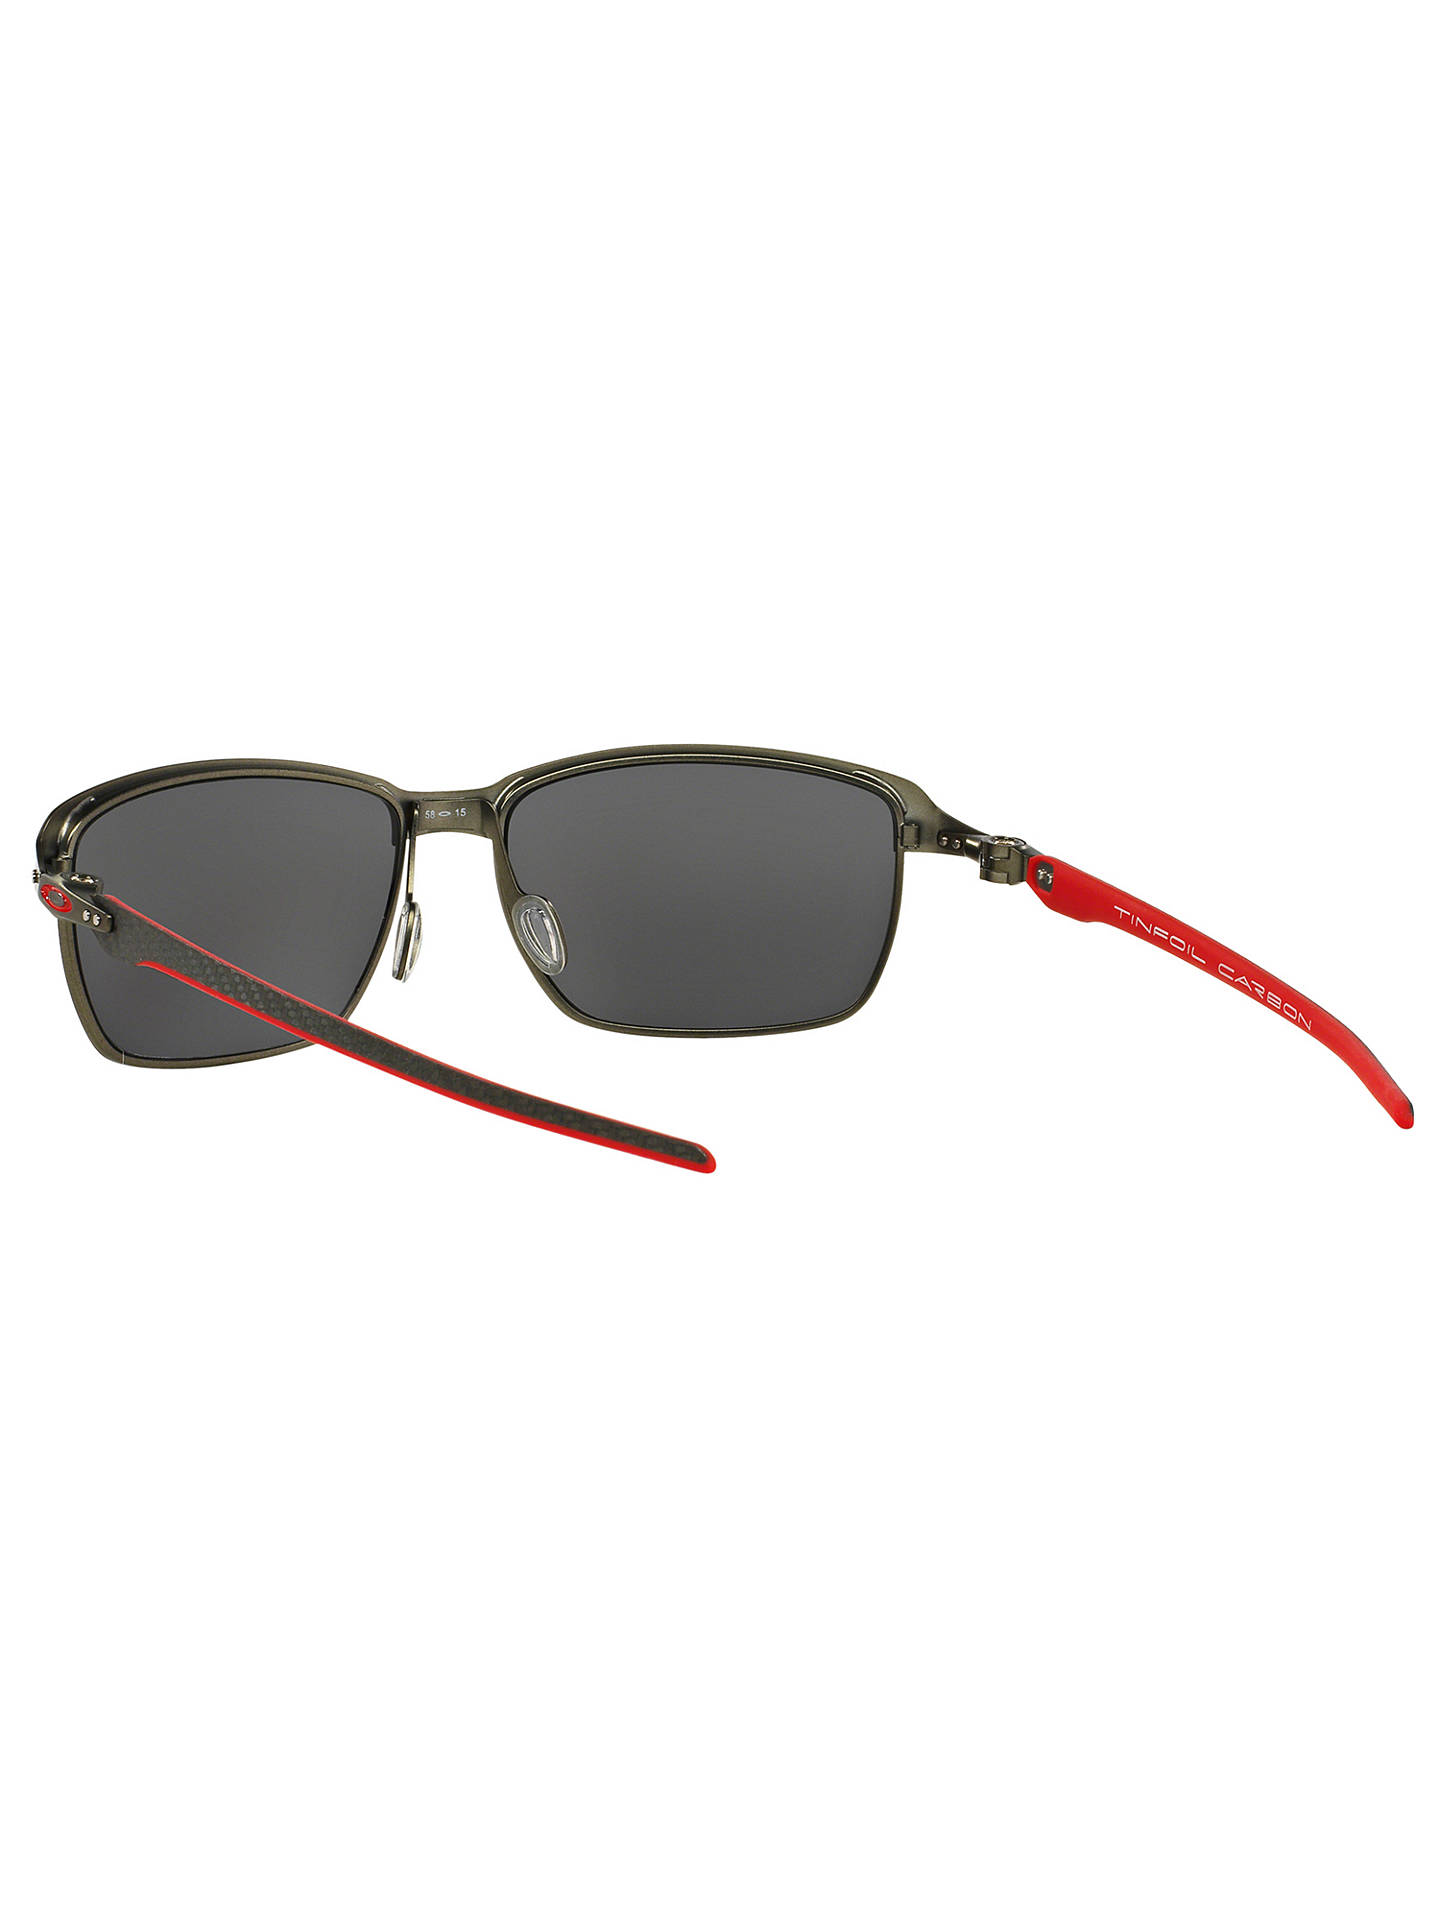 dbc85ee5c43 ... BuyOakley OO6018 Tinfoil Carbon Polarised Scuderia Ferrari Rectangular  Sunglasses Online at johnlewis.com ...